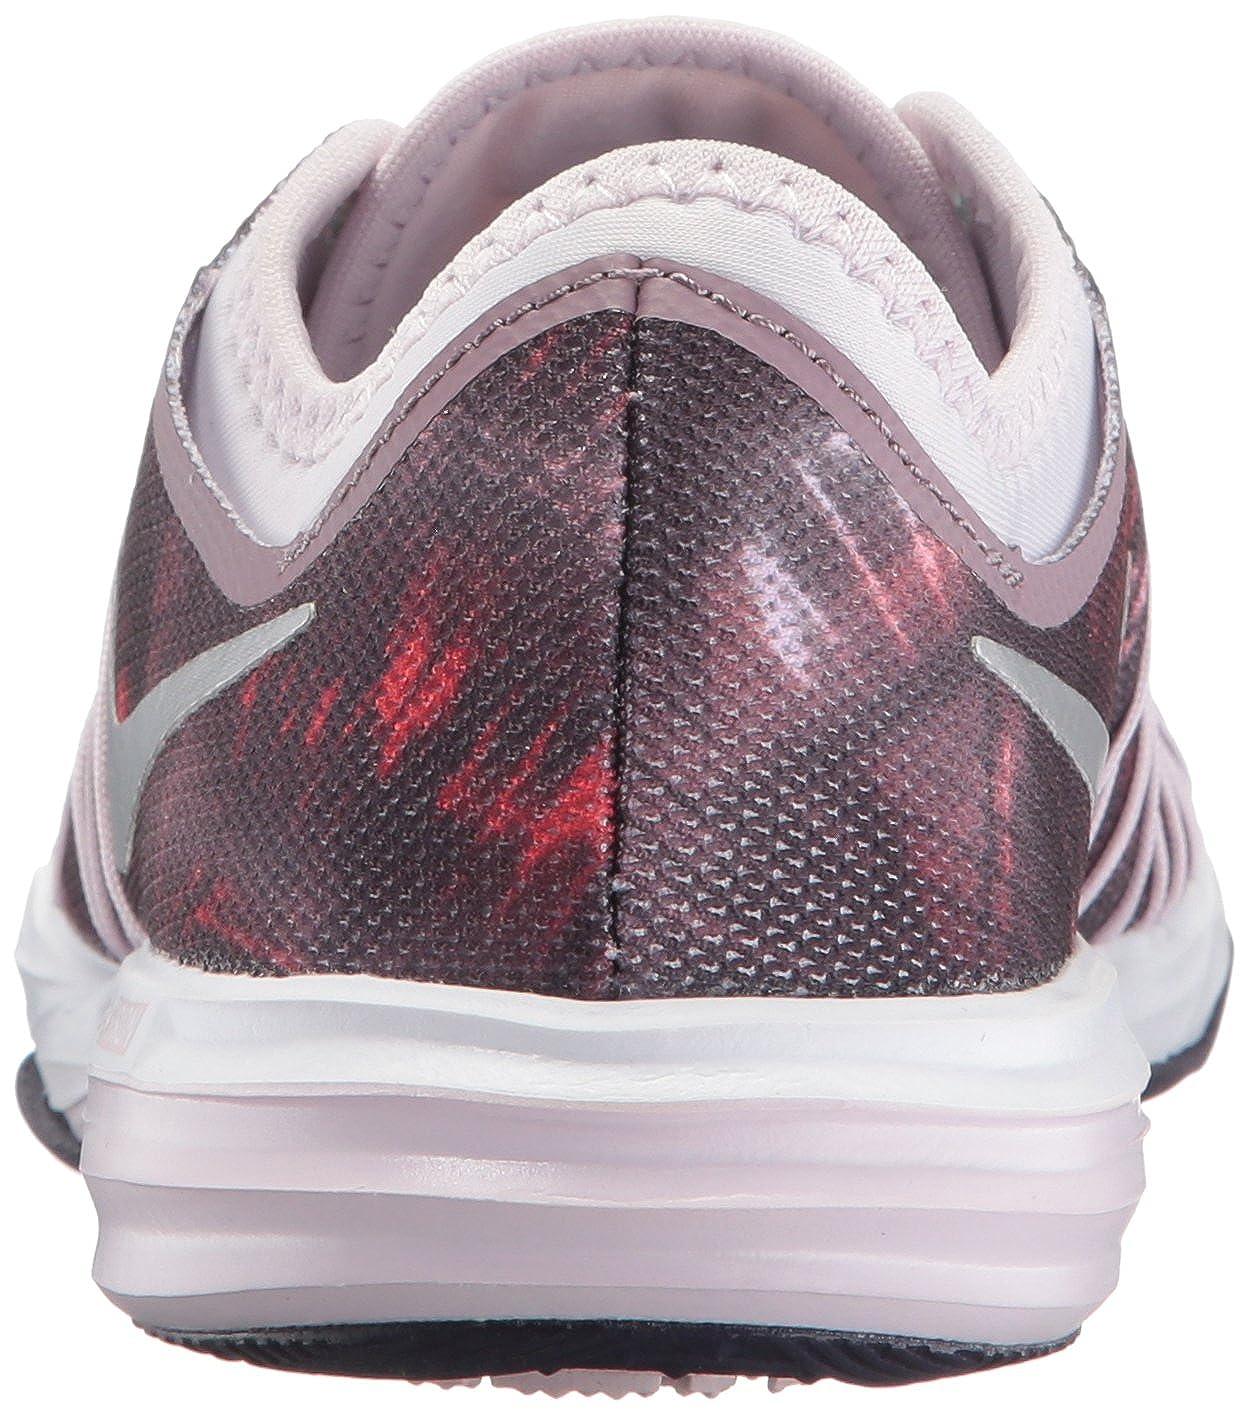 37e0bc57eaf2d7 844667 Vtwznwba Amp  Handtaschen Damen 500 Schuhe Fitnessschuhe Nike  p8ZRdqgq